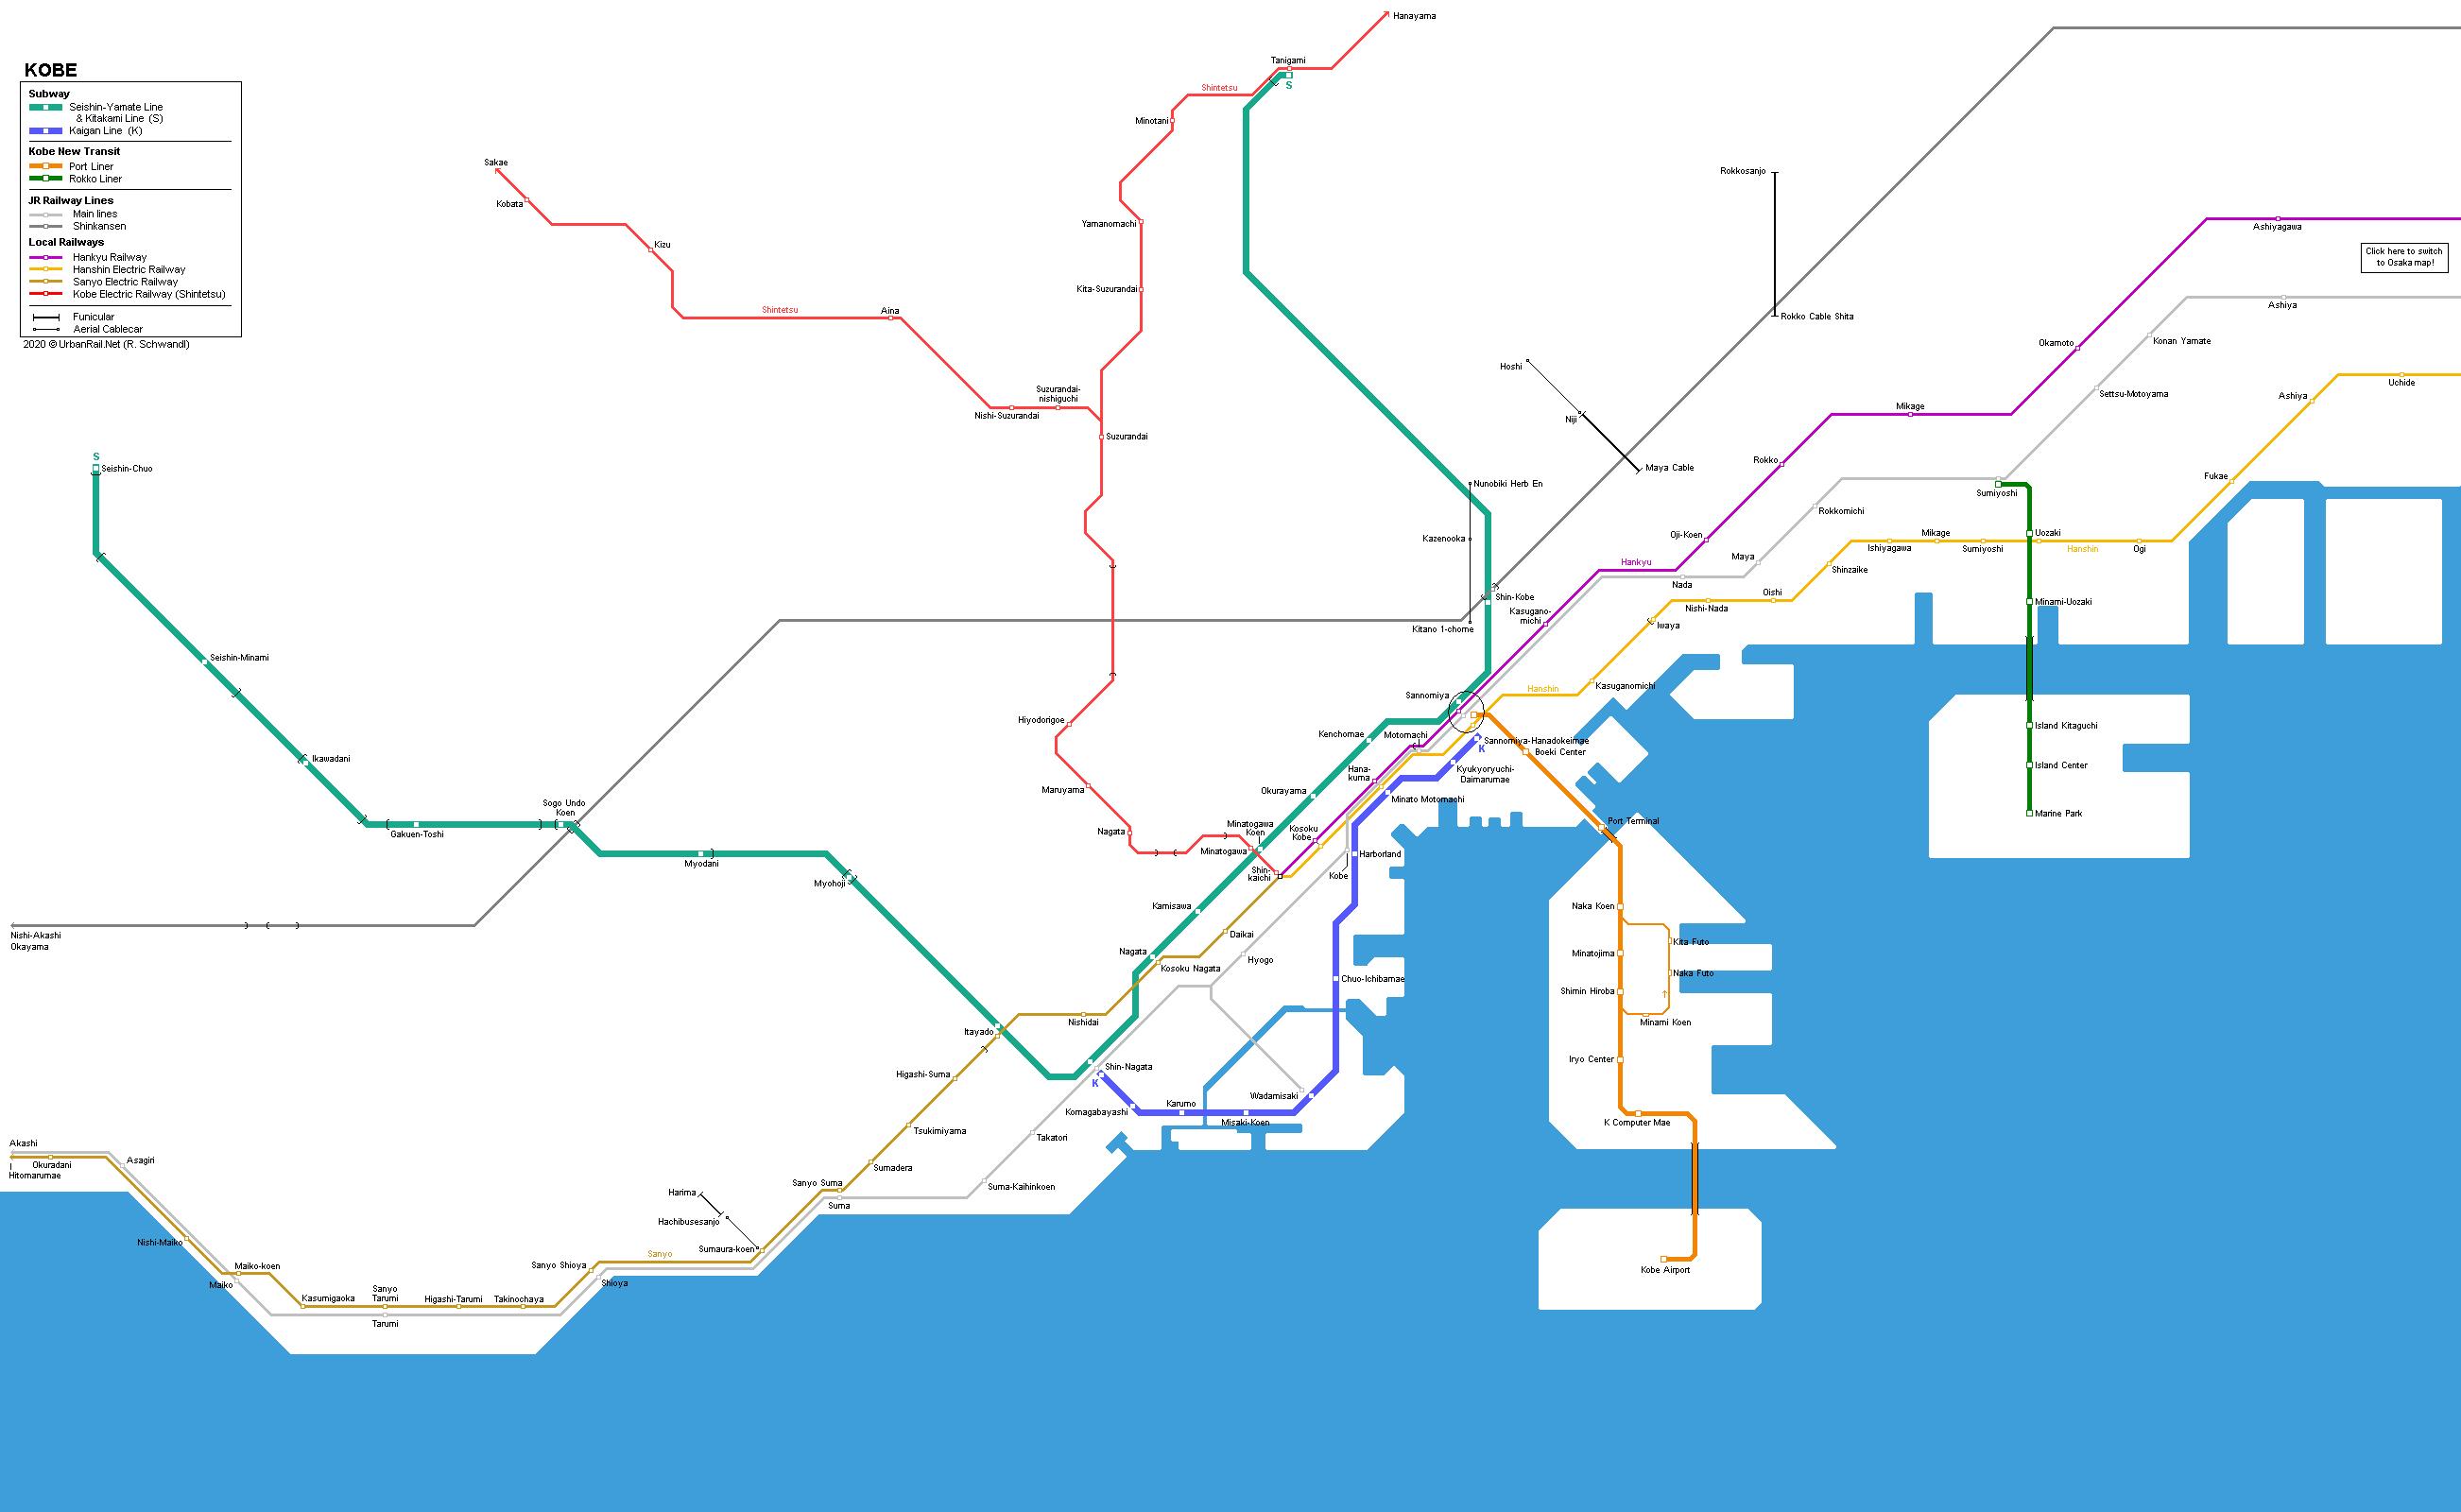 UrbanRailNet Kobe Railway Map Subway JR Local Railways